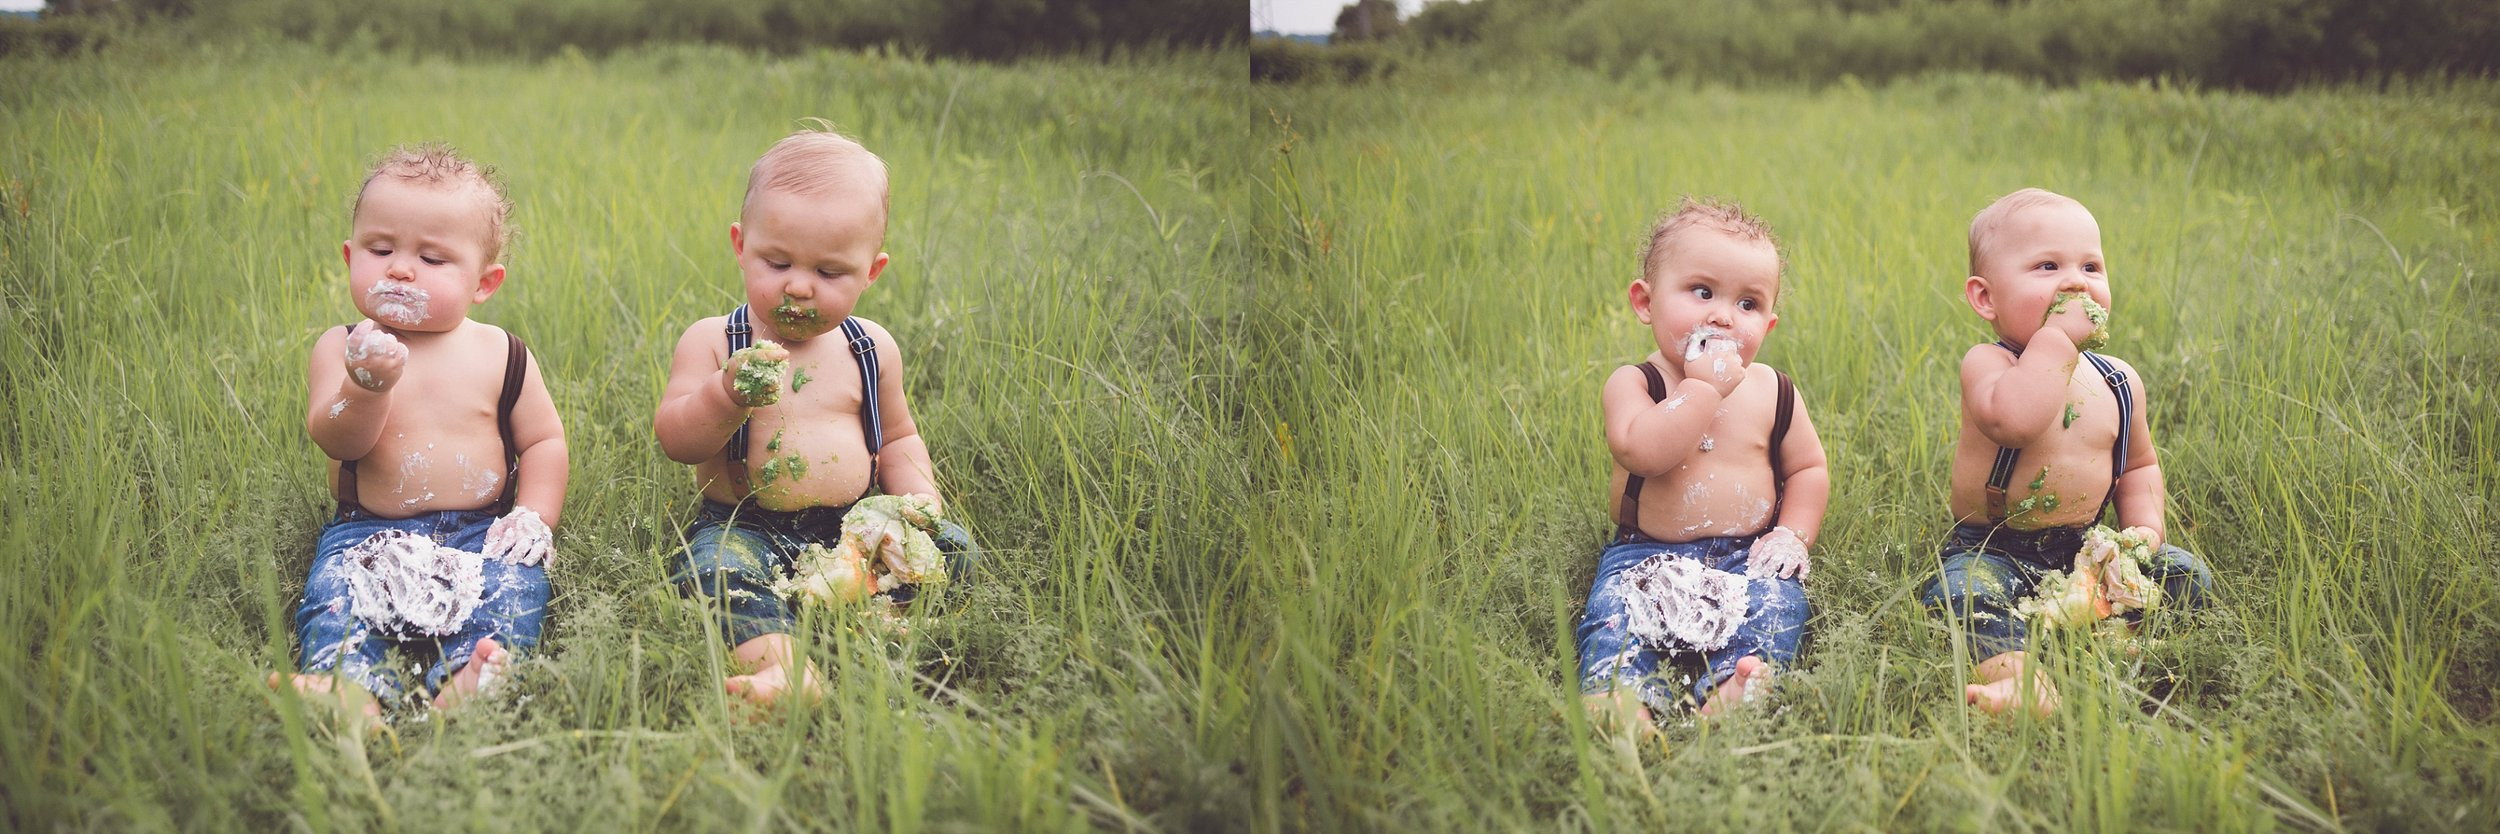 BrittneyHogue=FamilyPhotographer-CakeSmash-PeoriaIL-PekinIL (9).jpg